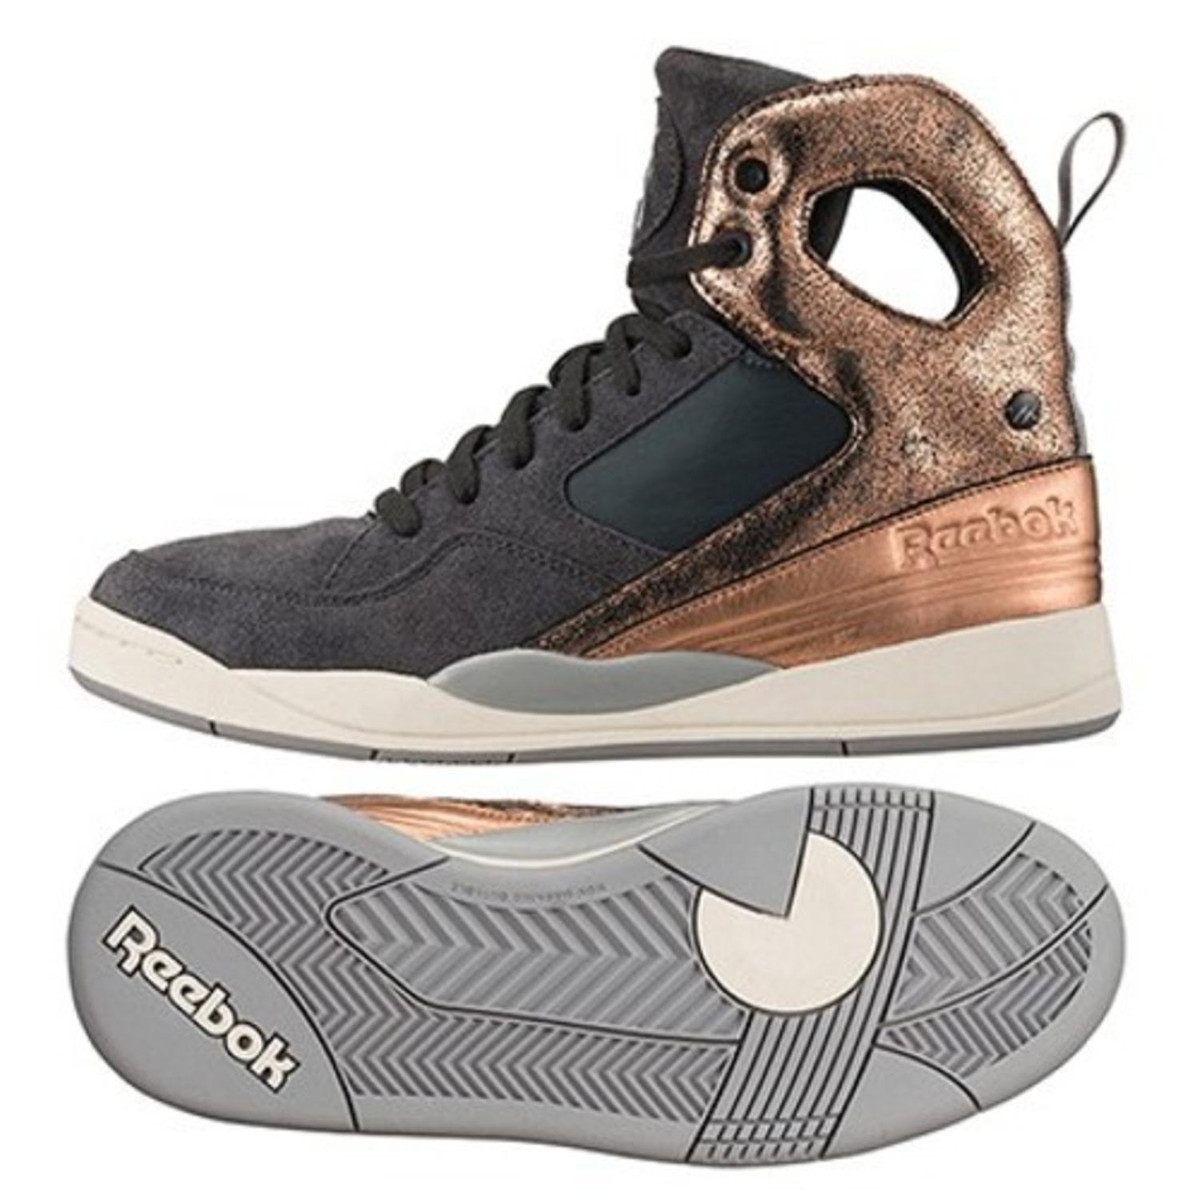 Reebok Damen Sneaker Schuhe Schuhe Sneaker Alicia Keys Court Gravel Rose Gold ... e4b537